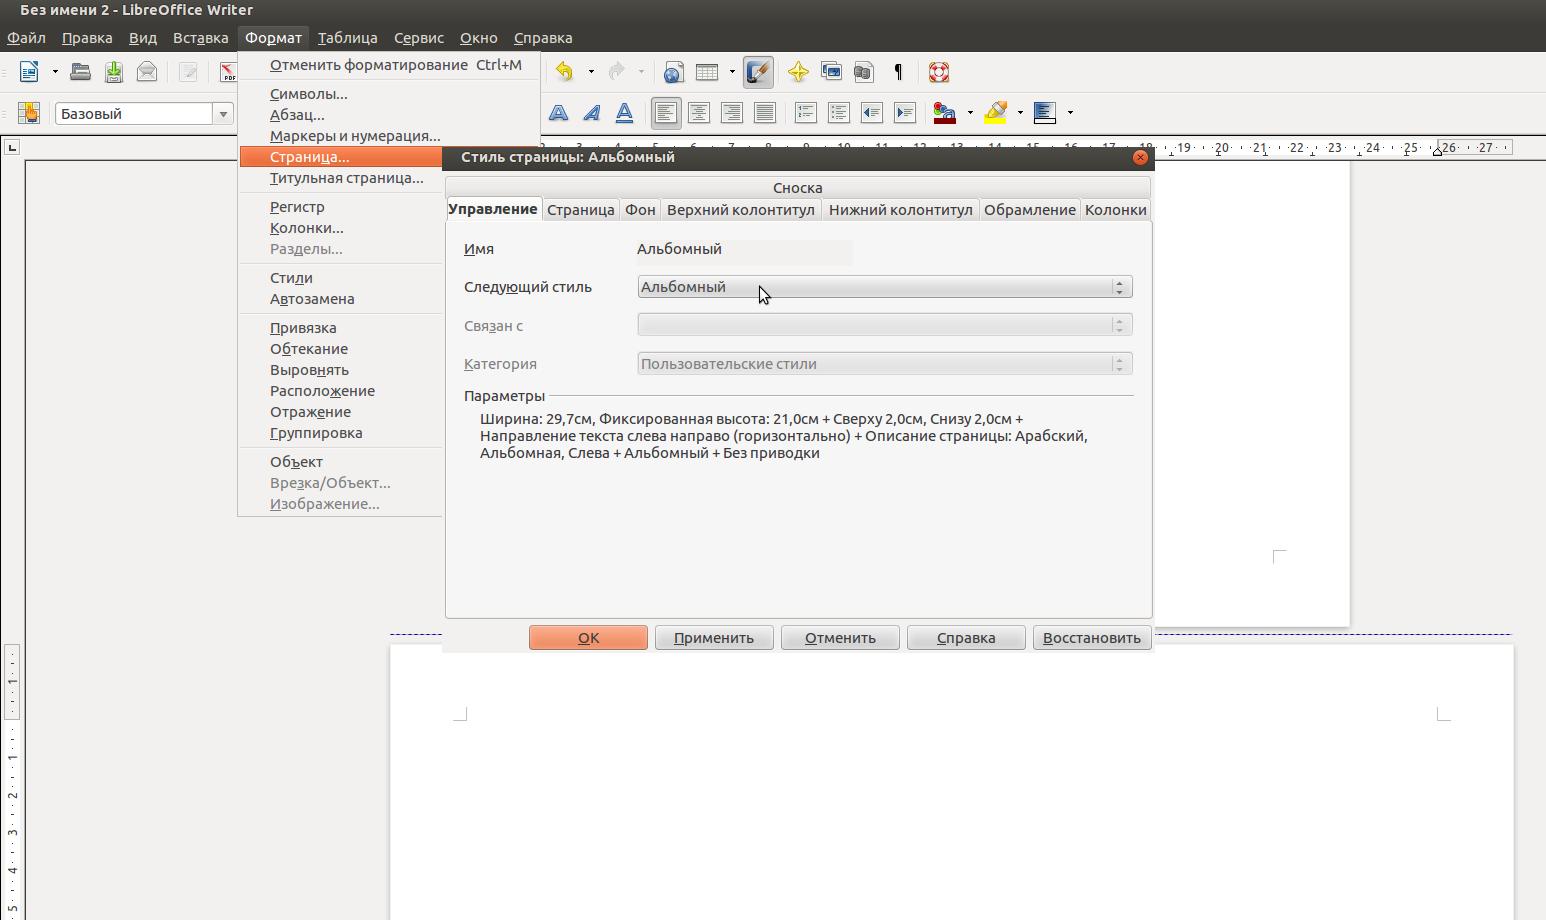 Writer. Страницы. Нумерация страниц - Apache OpenOffice Wiki 19